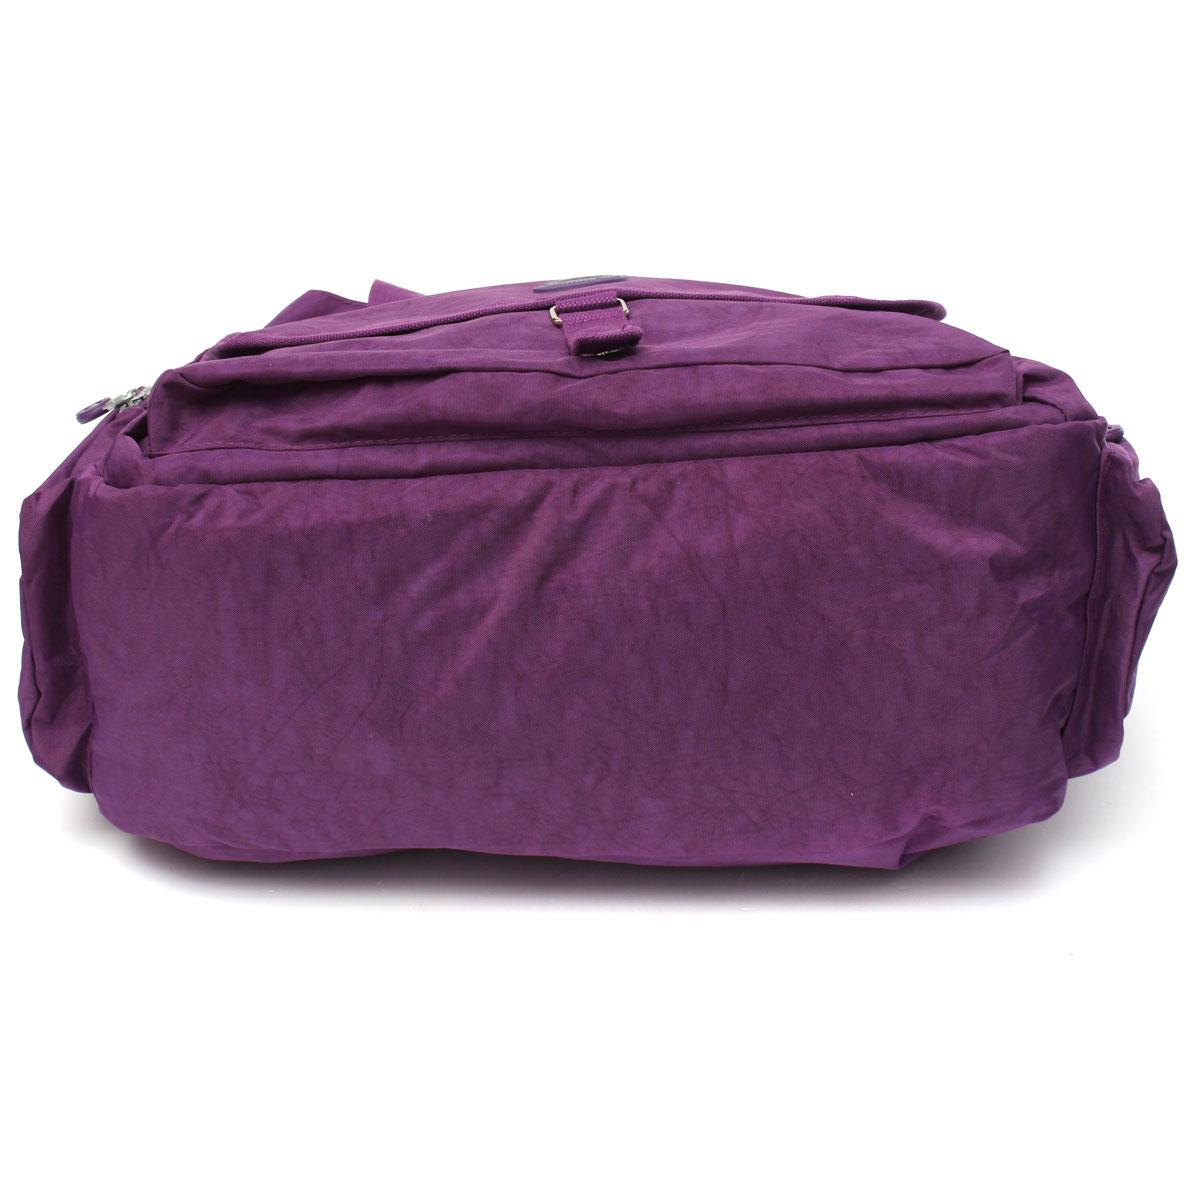 landuo baby changing bag large mummy diaper nappy shoulder handbag travel purple export intl. Black Bedroom Furniture Sets. Home Design Ideas